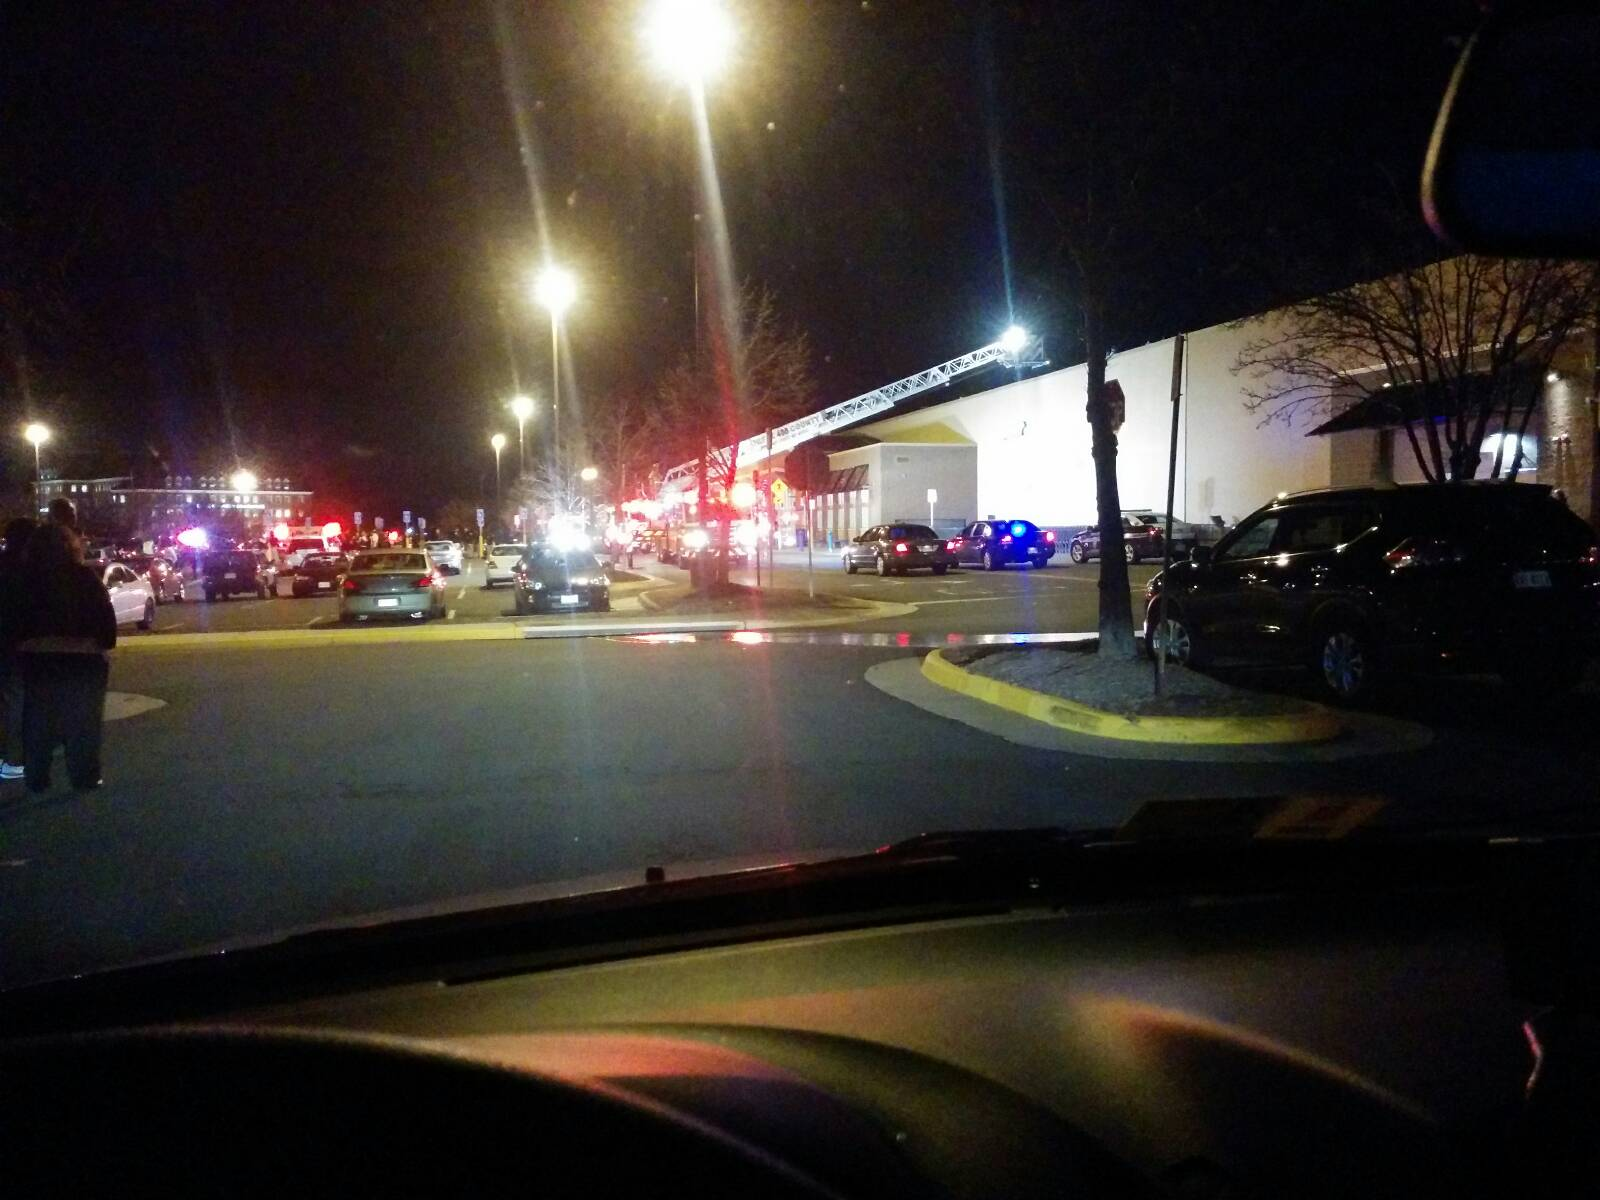 Wal-Mart fire intentionally set